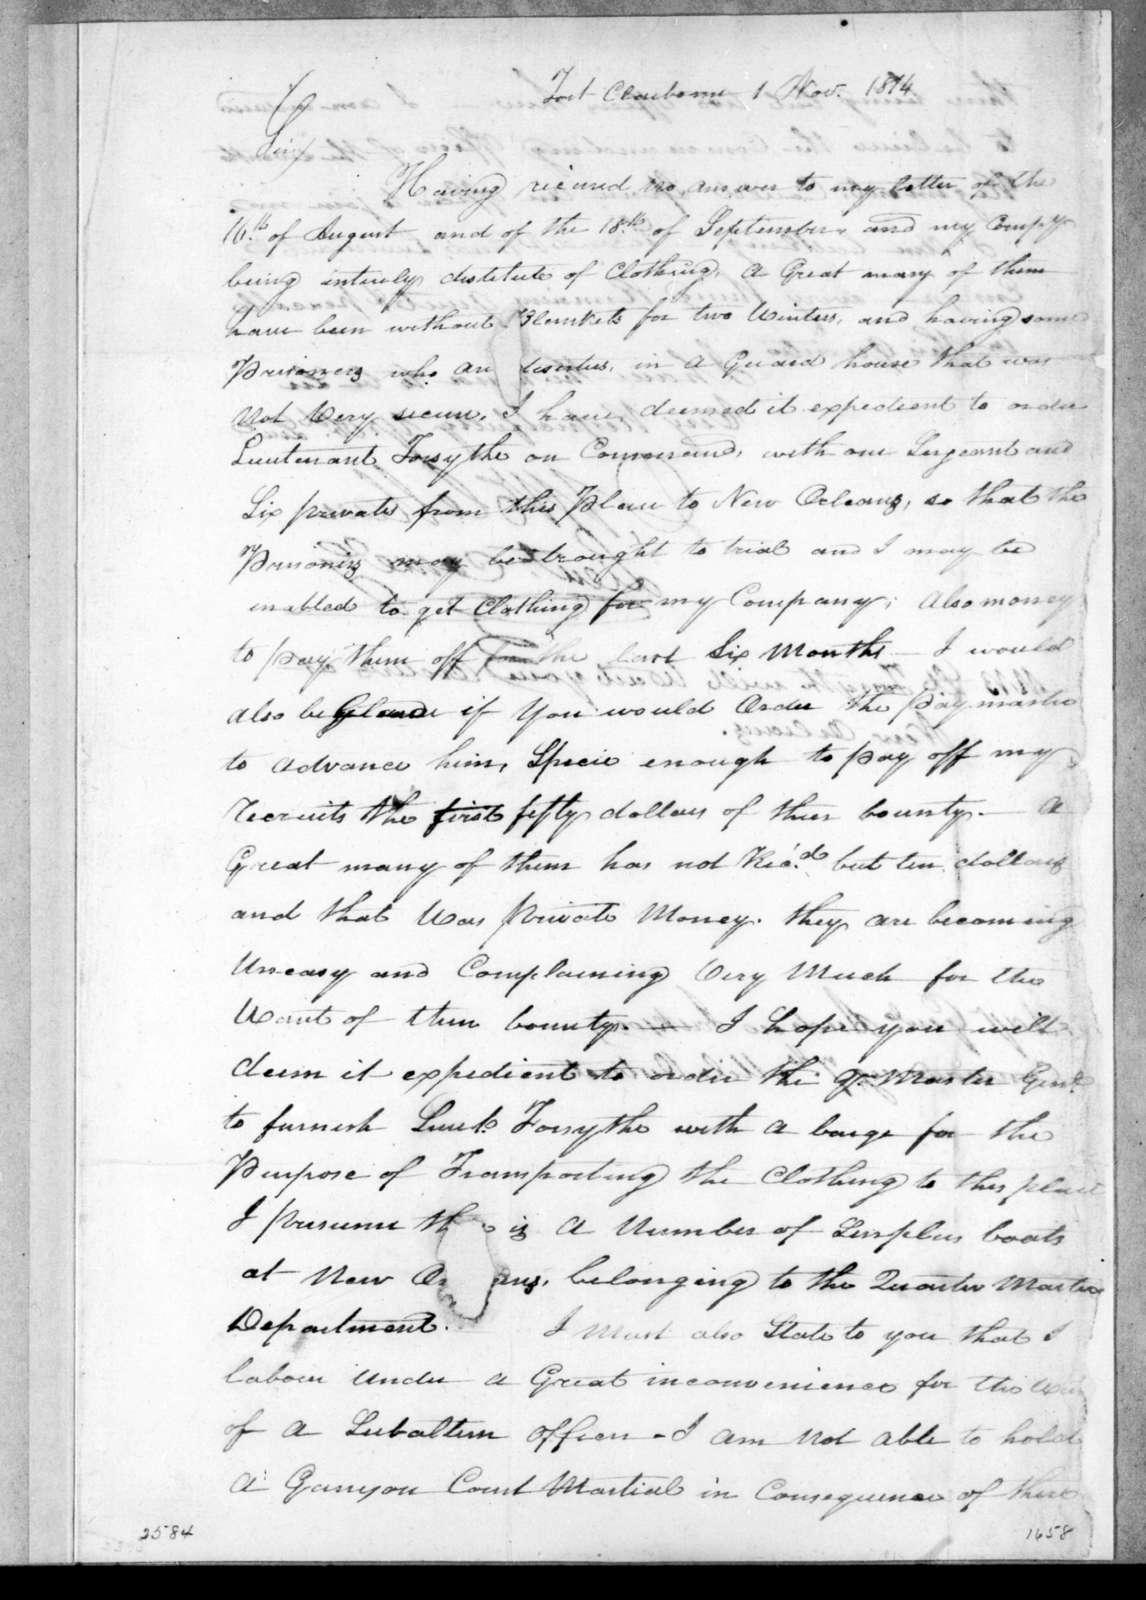 David McClellan to Andrew Jackson, November 1, 1814